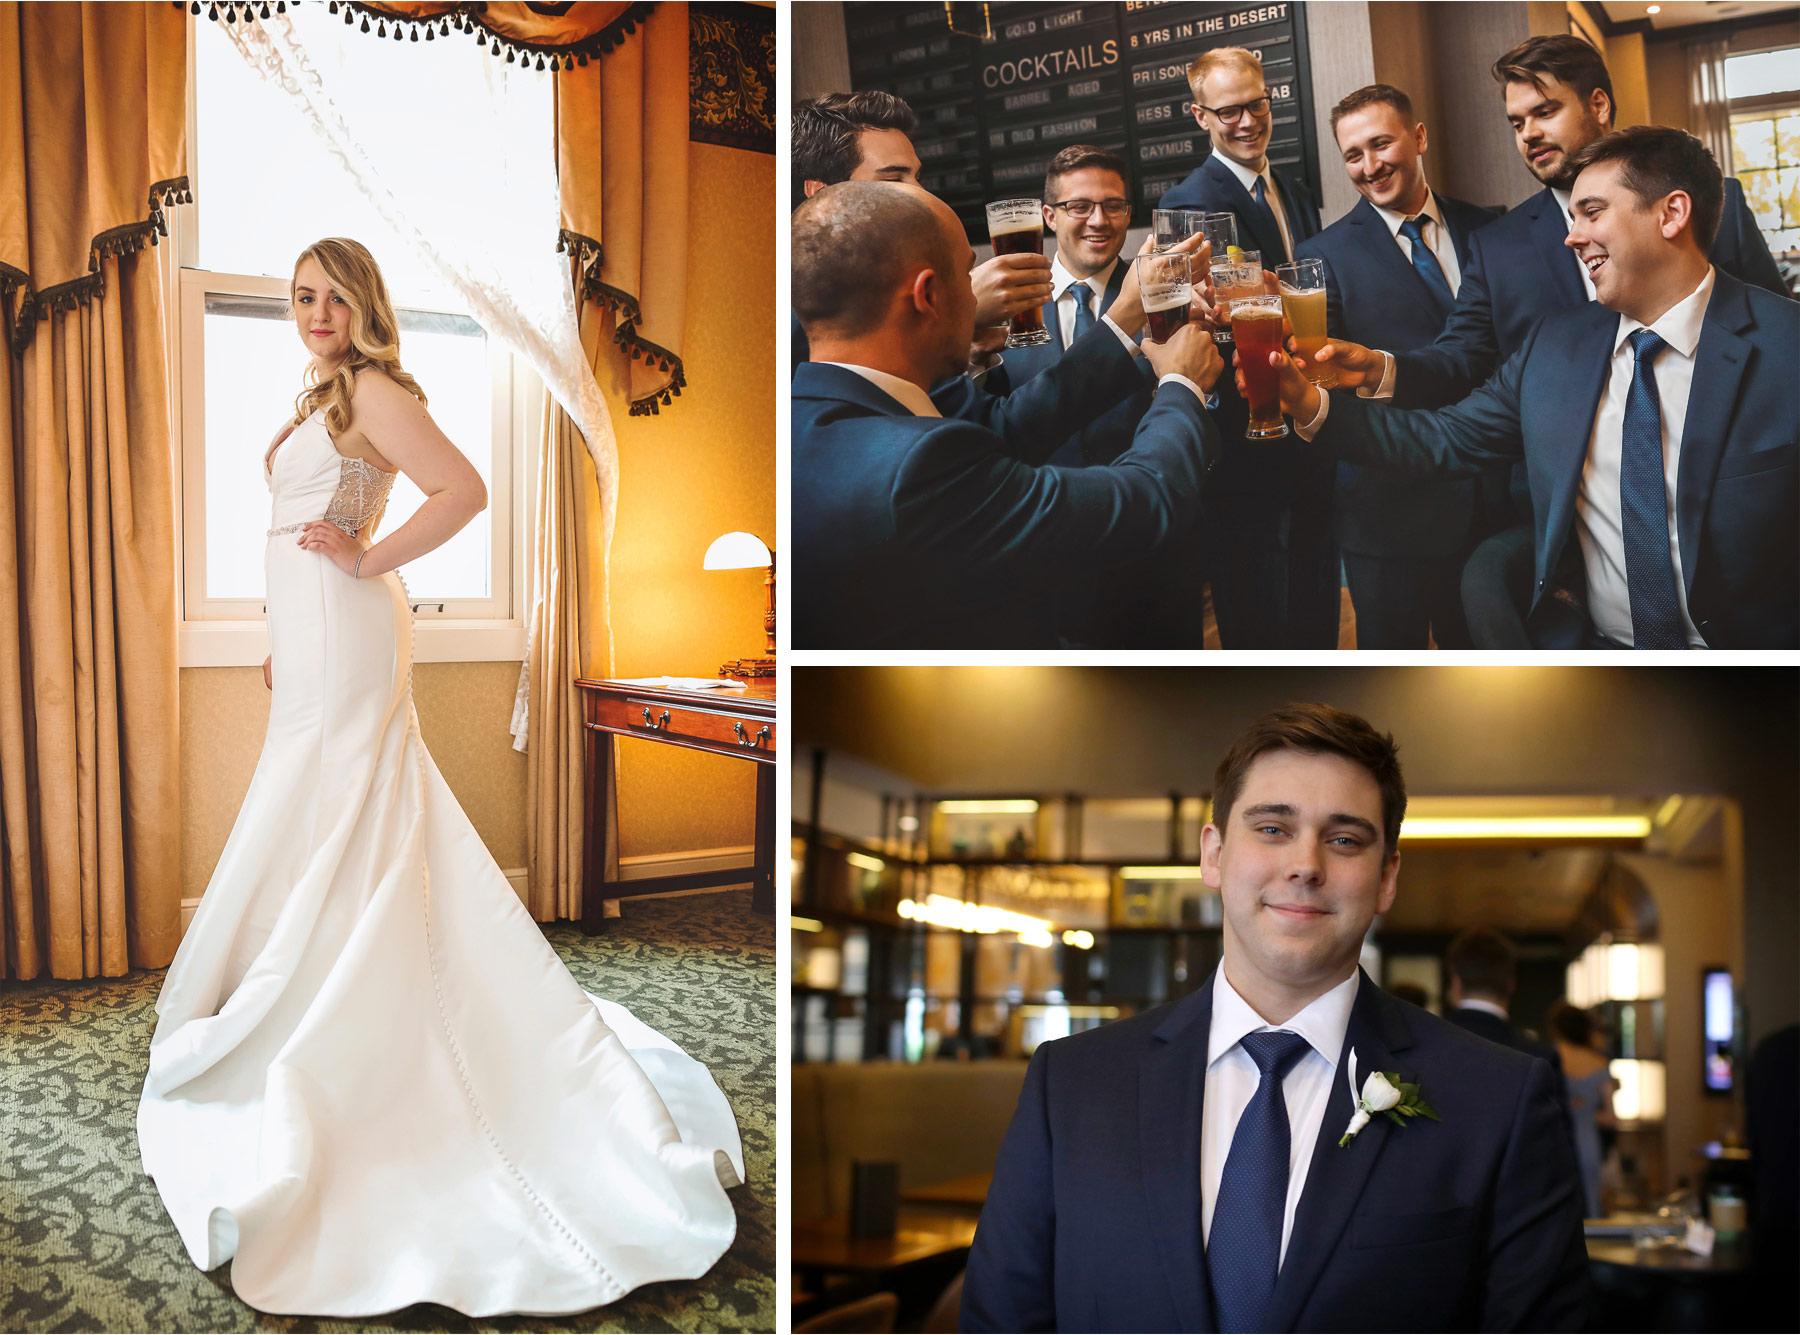 04-Minneapolis-Minnesota-Wedding-Vick-Photography-The-Depot-Bride-Dress-Hotel-Groom-Groomsmen-Toast-Amelia-and-Alexander.jpg